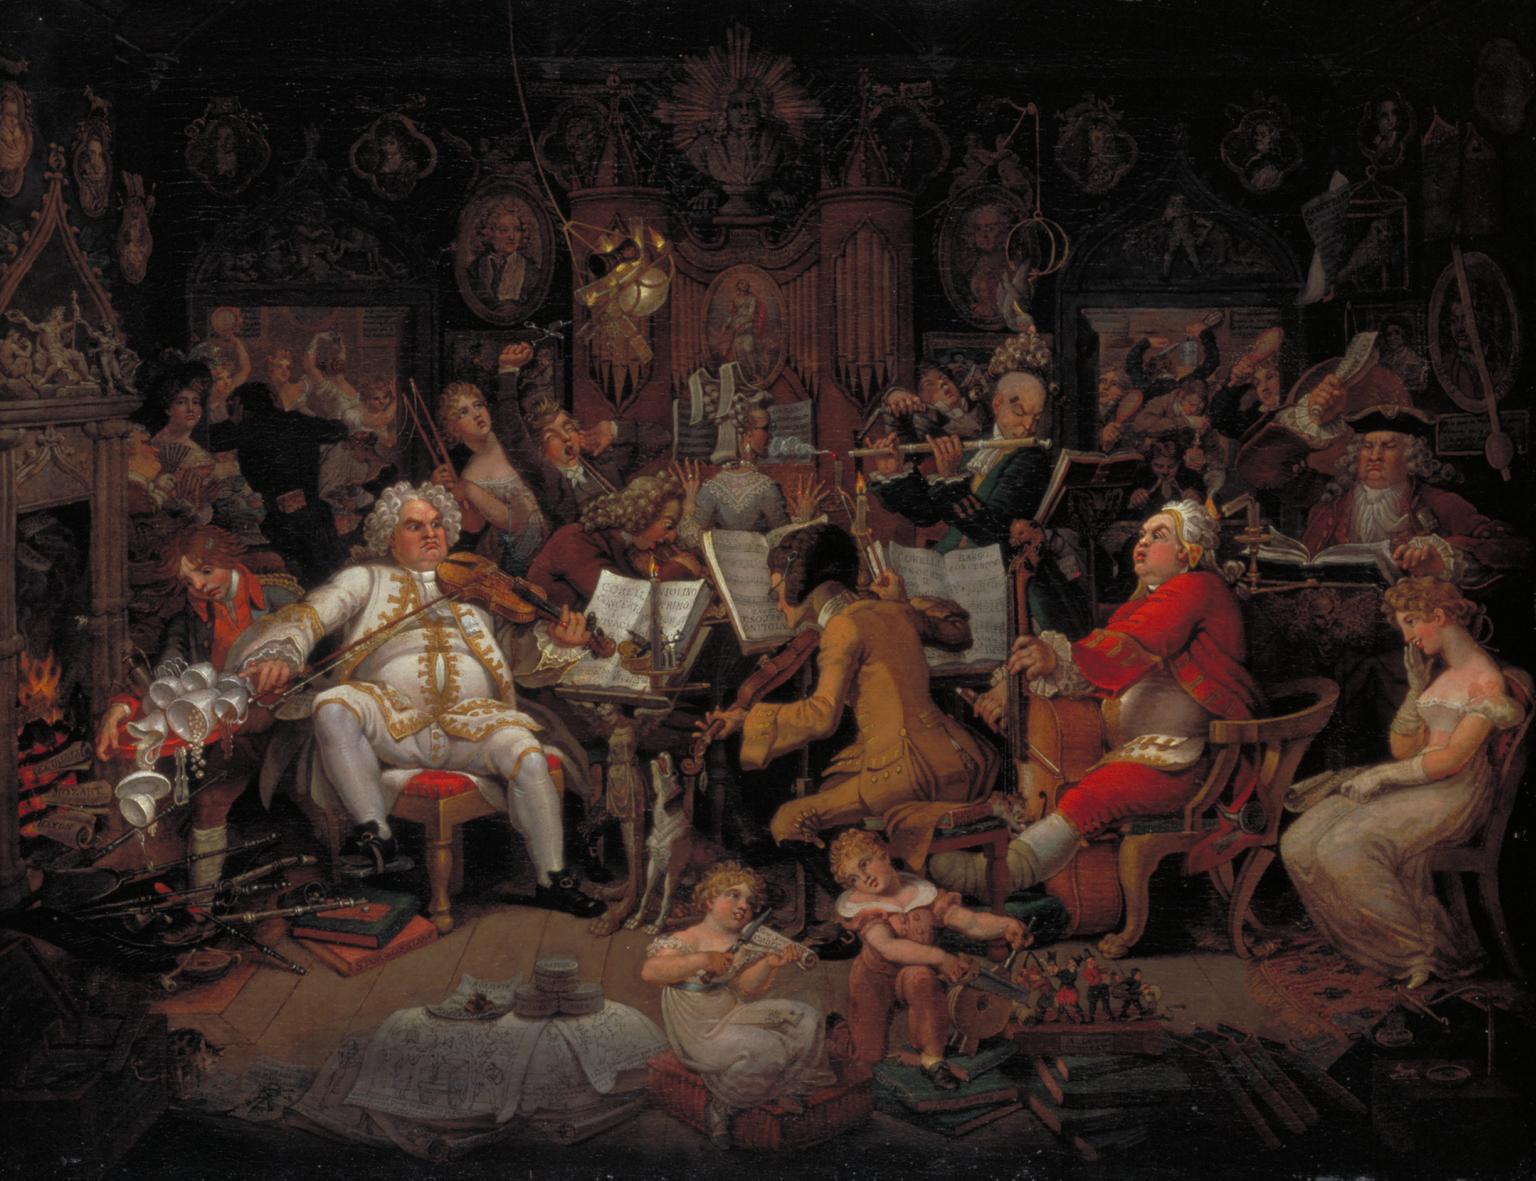 Amateurs of Tye-Wig Music ('Musicians of the Old School') c.1820 by Edward Francis Burney, Amatorzy muzyki perukowej